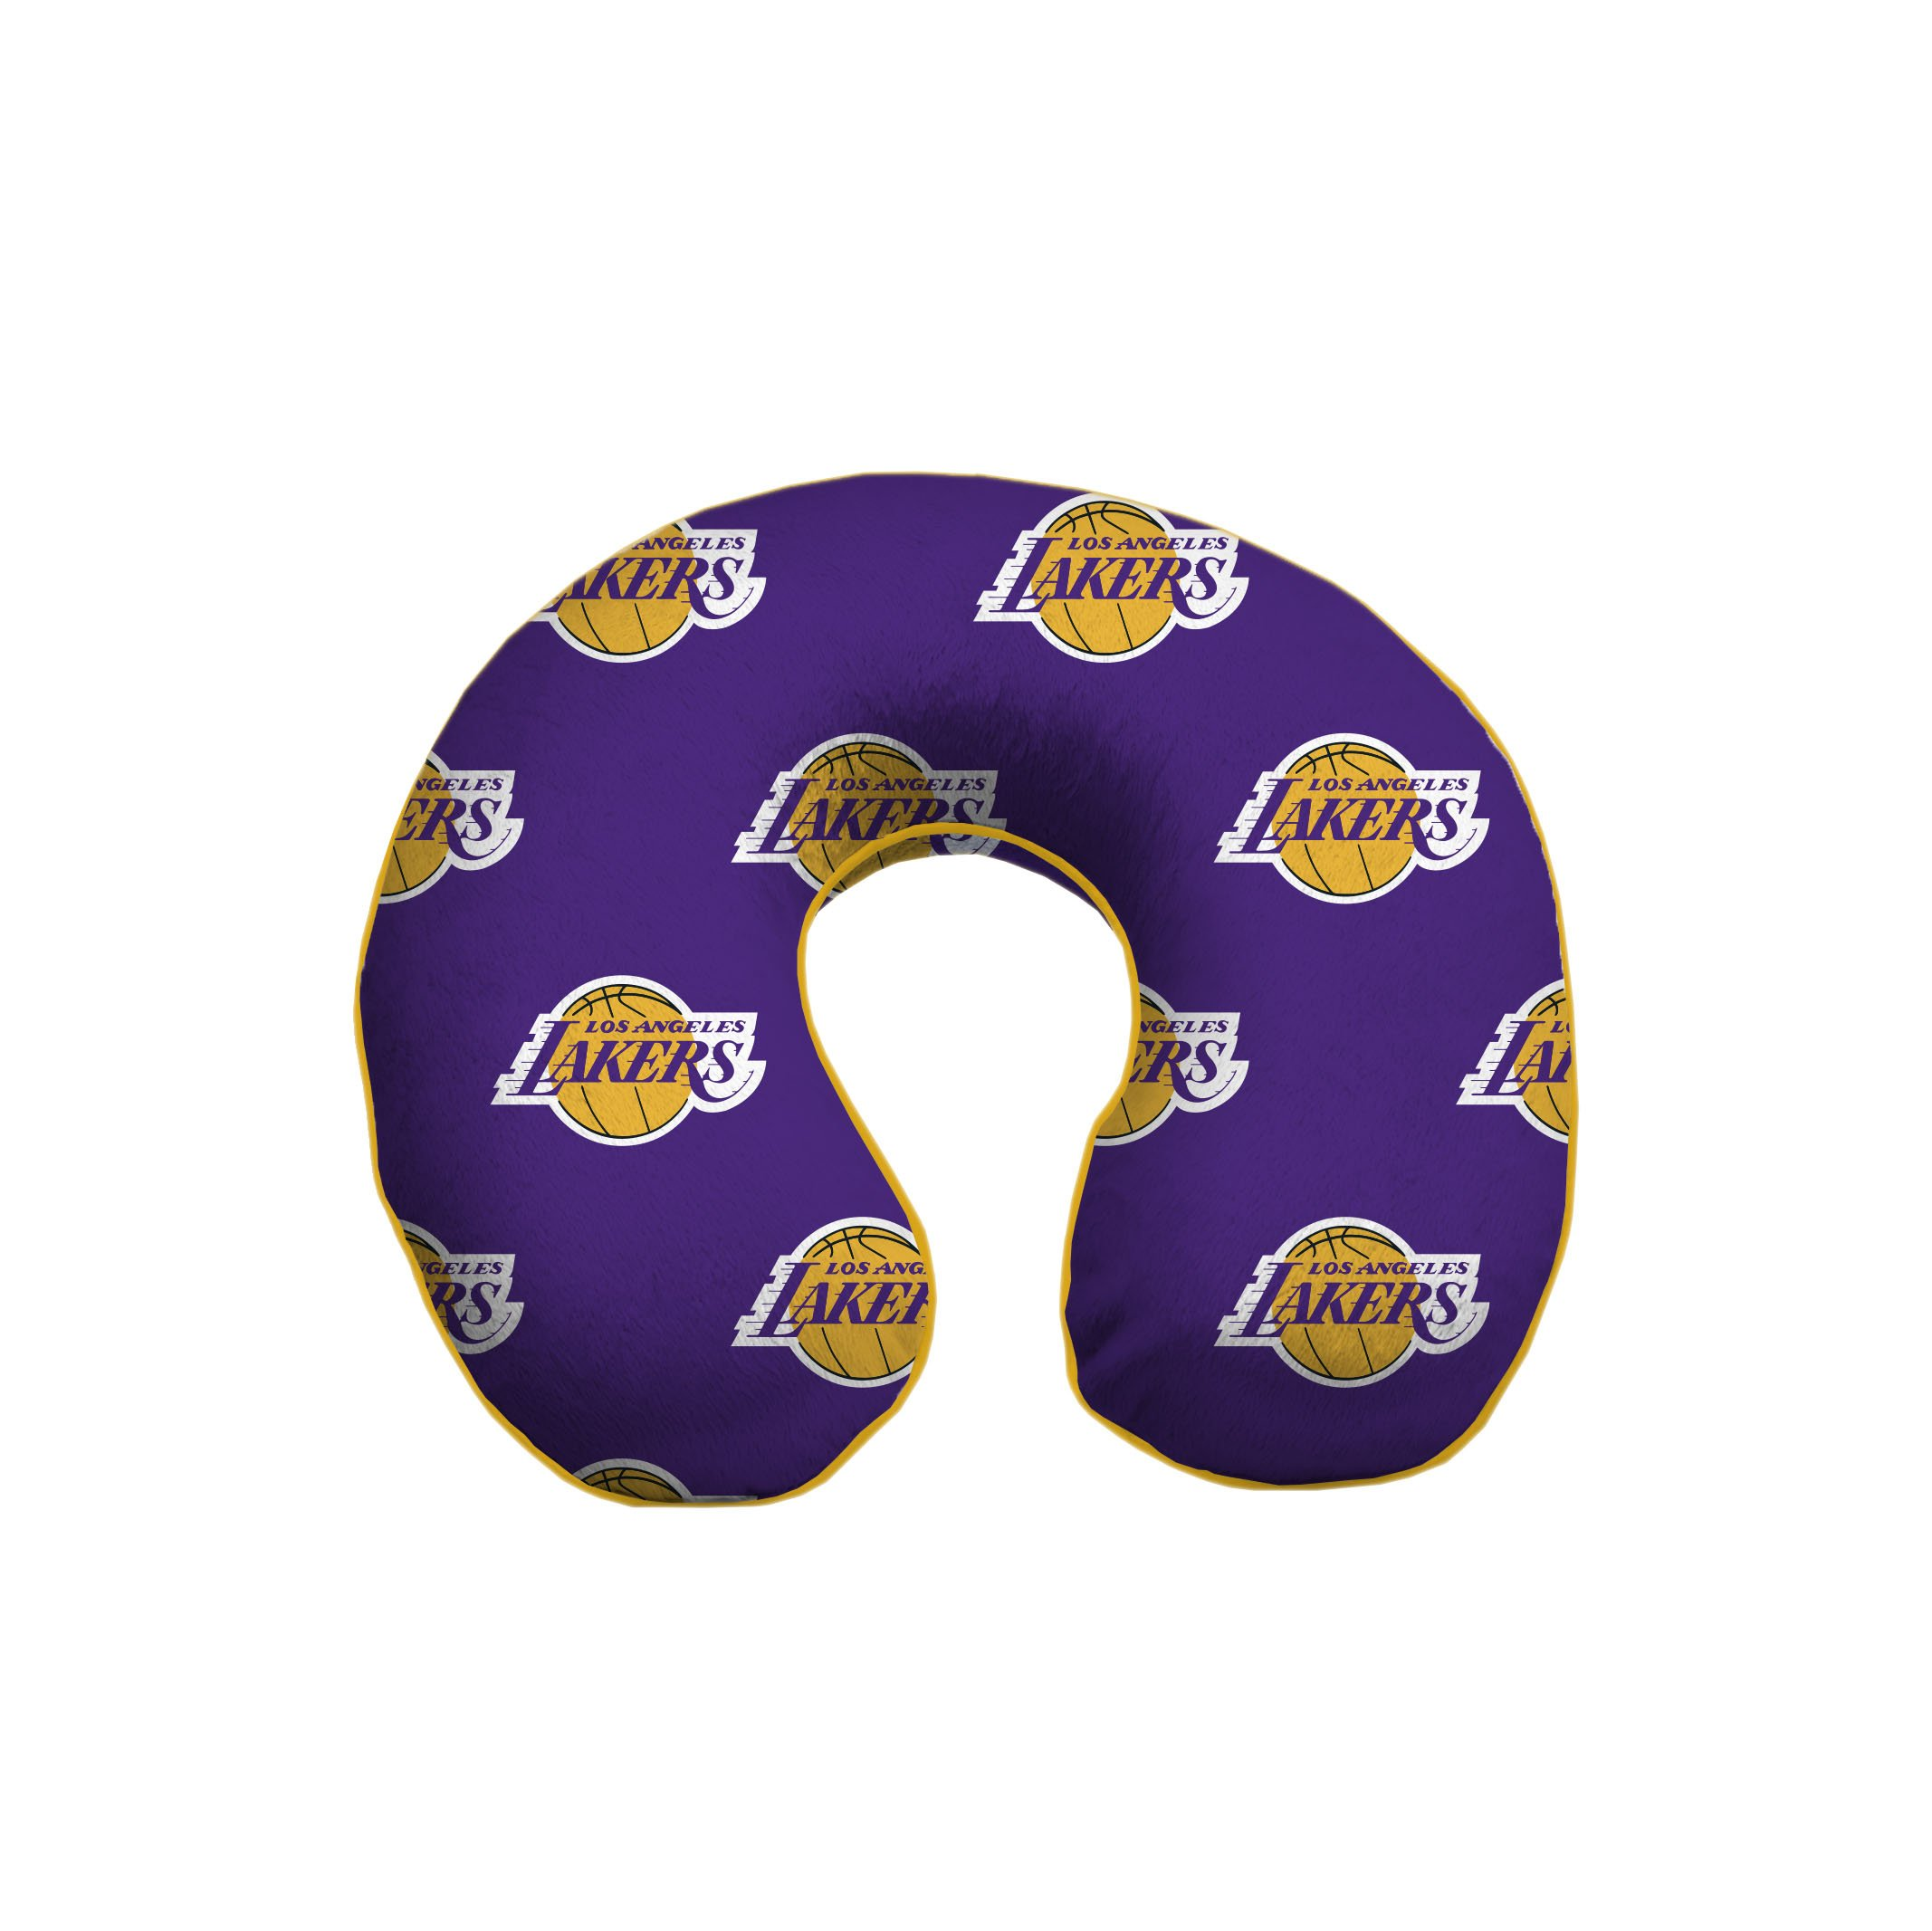 Pegasus Sports NBA Los Angeles Lakers Unisex Nbanba U-Neck Memory Foam Travel Pillow, Gold, One Size